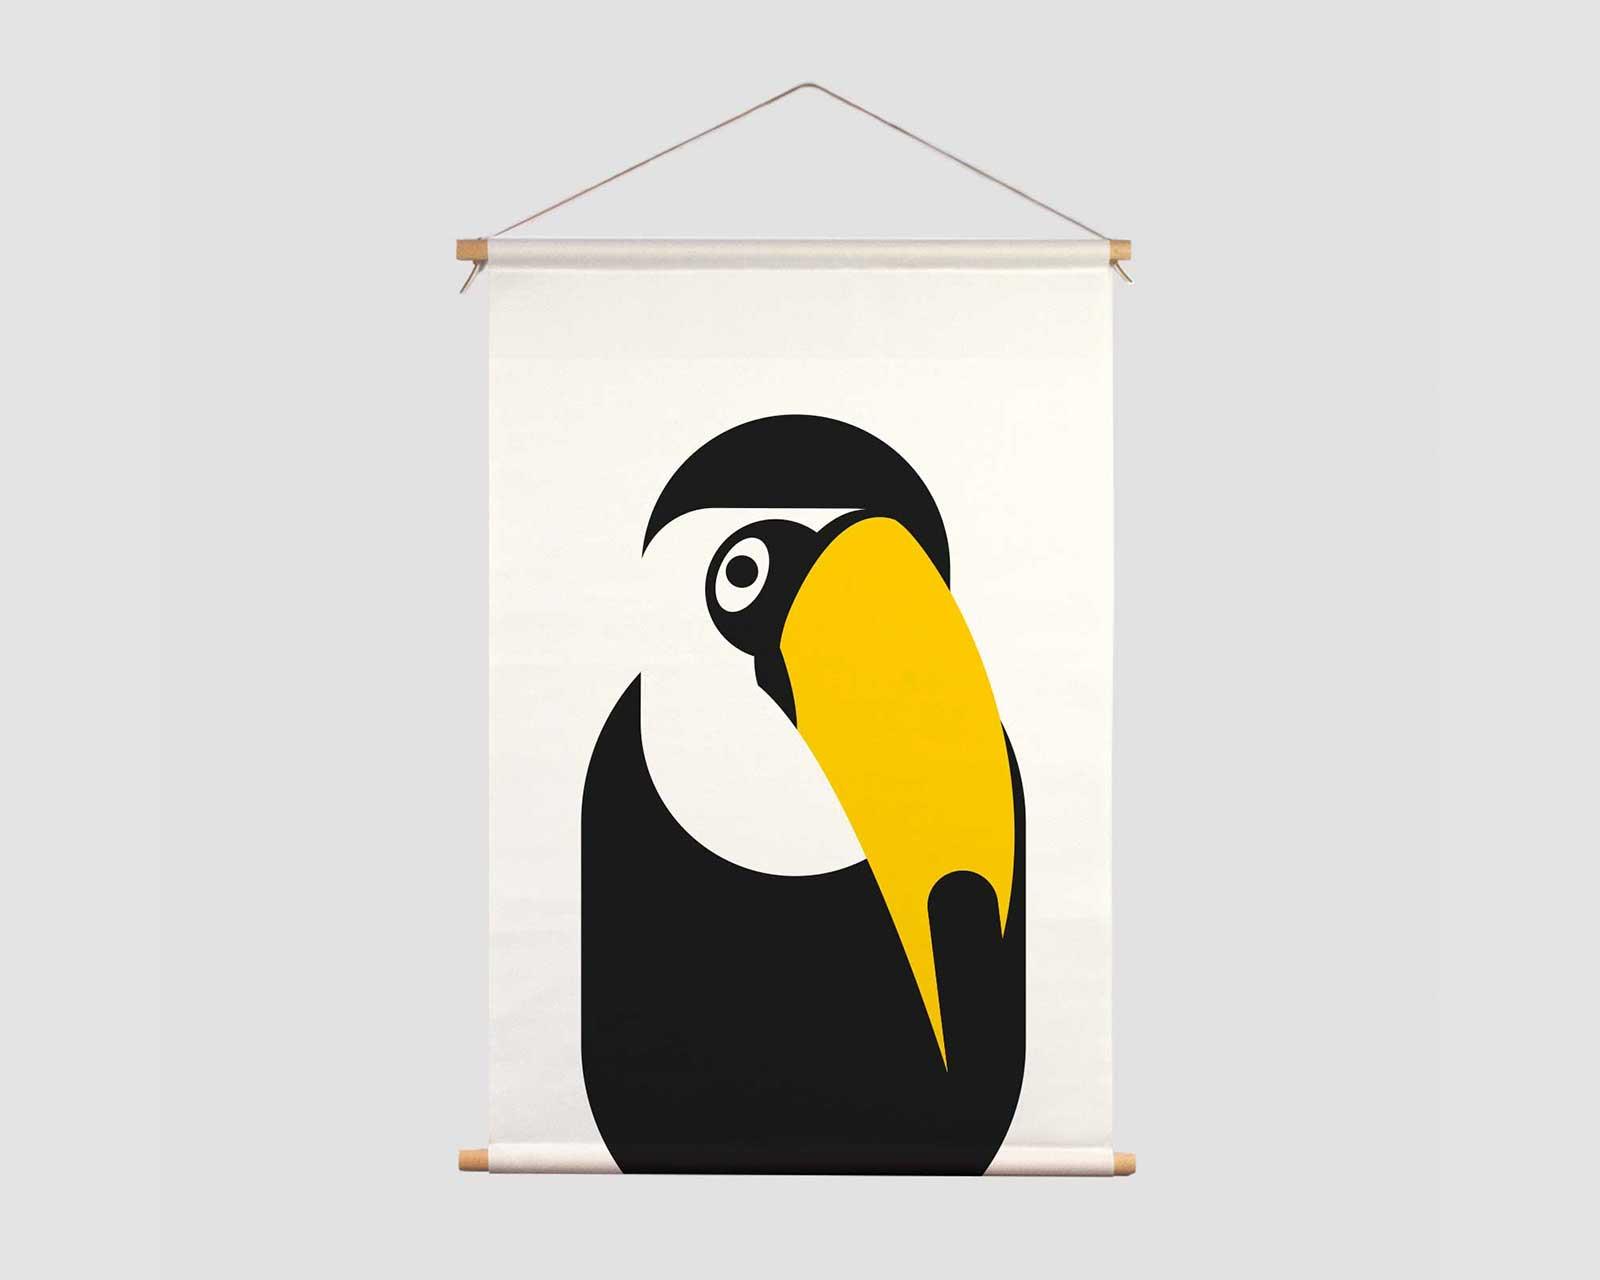 Textielposter zwart-wit print aapje Pie TuCan zwart wit kraamcadeau jungle decoratie kinderkamer